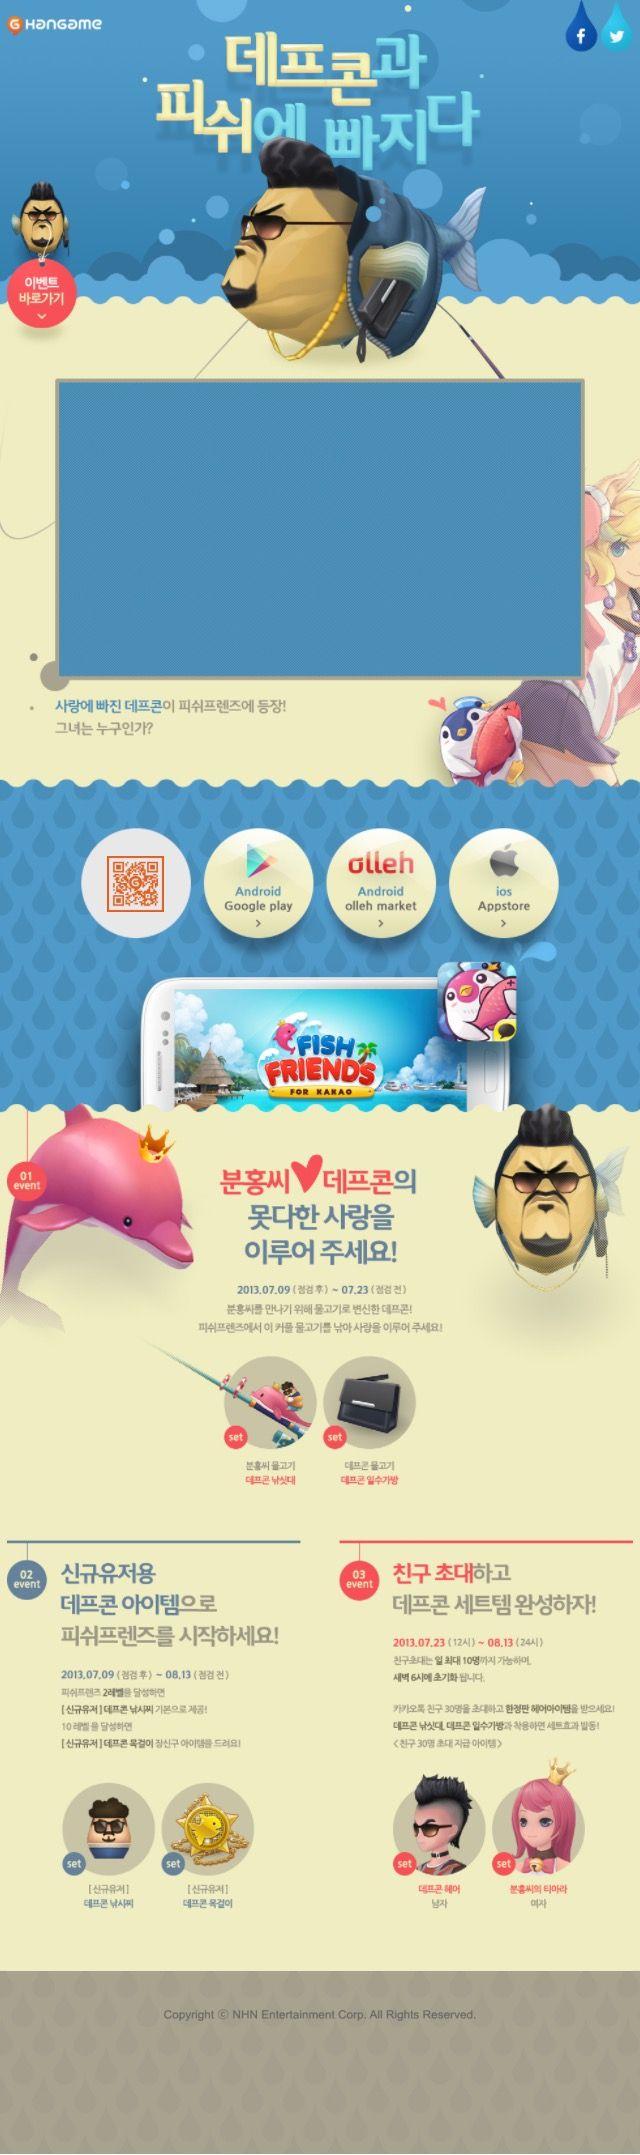 #FishFriendsDefcon #Mobile #Game #Website #Inspiration